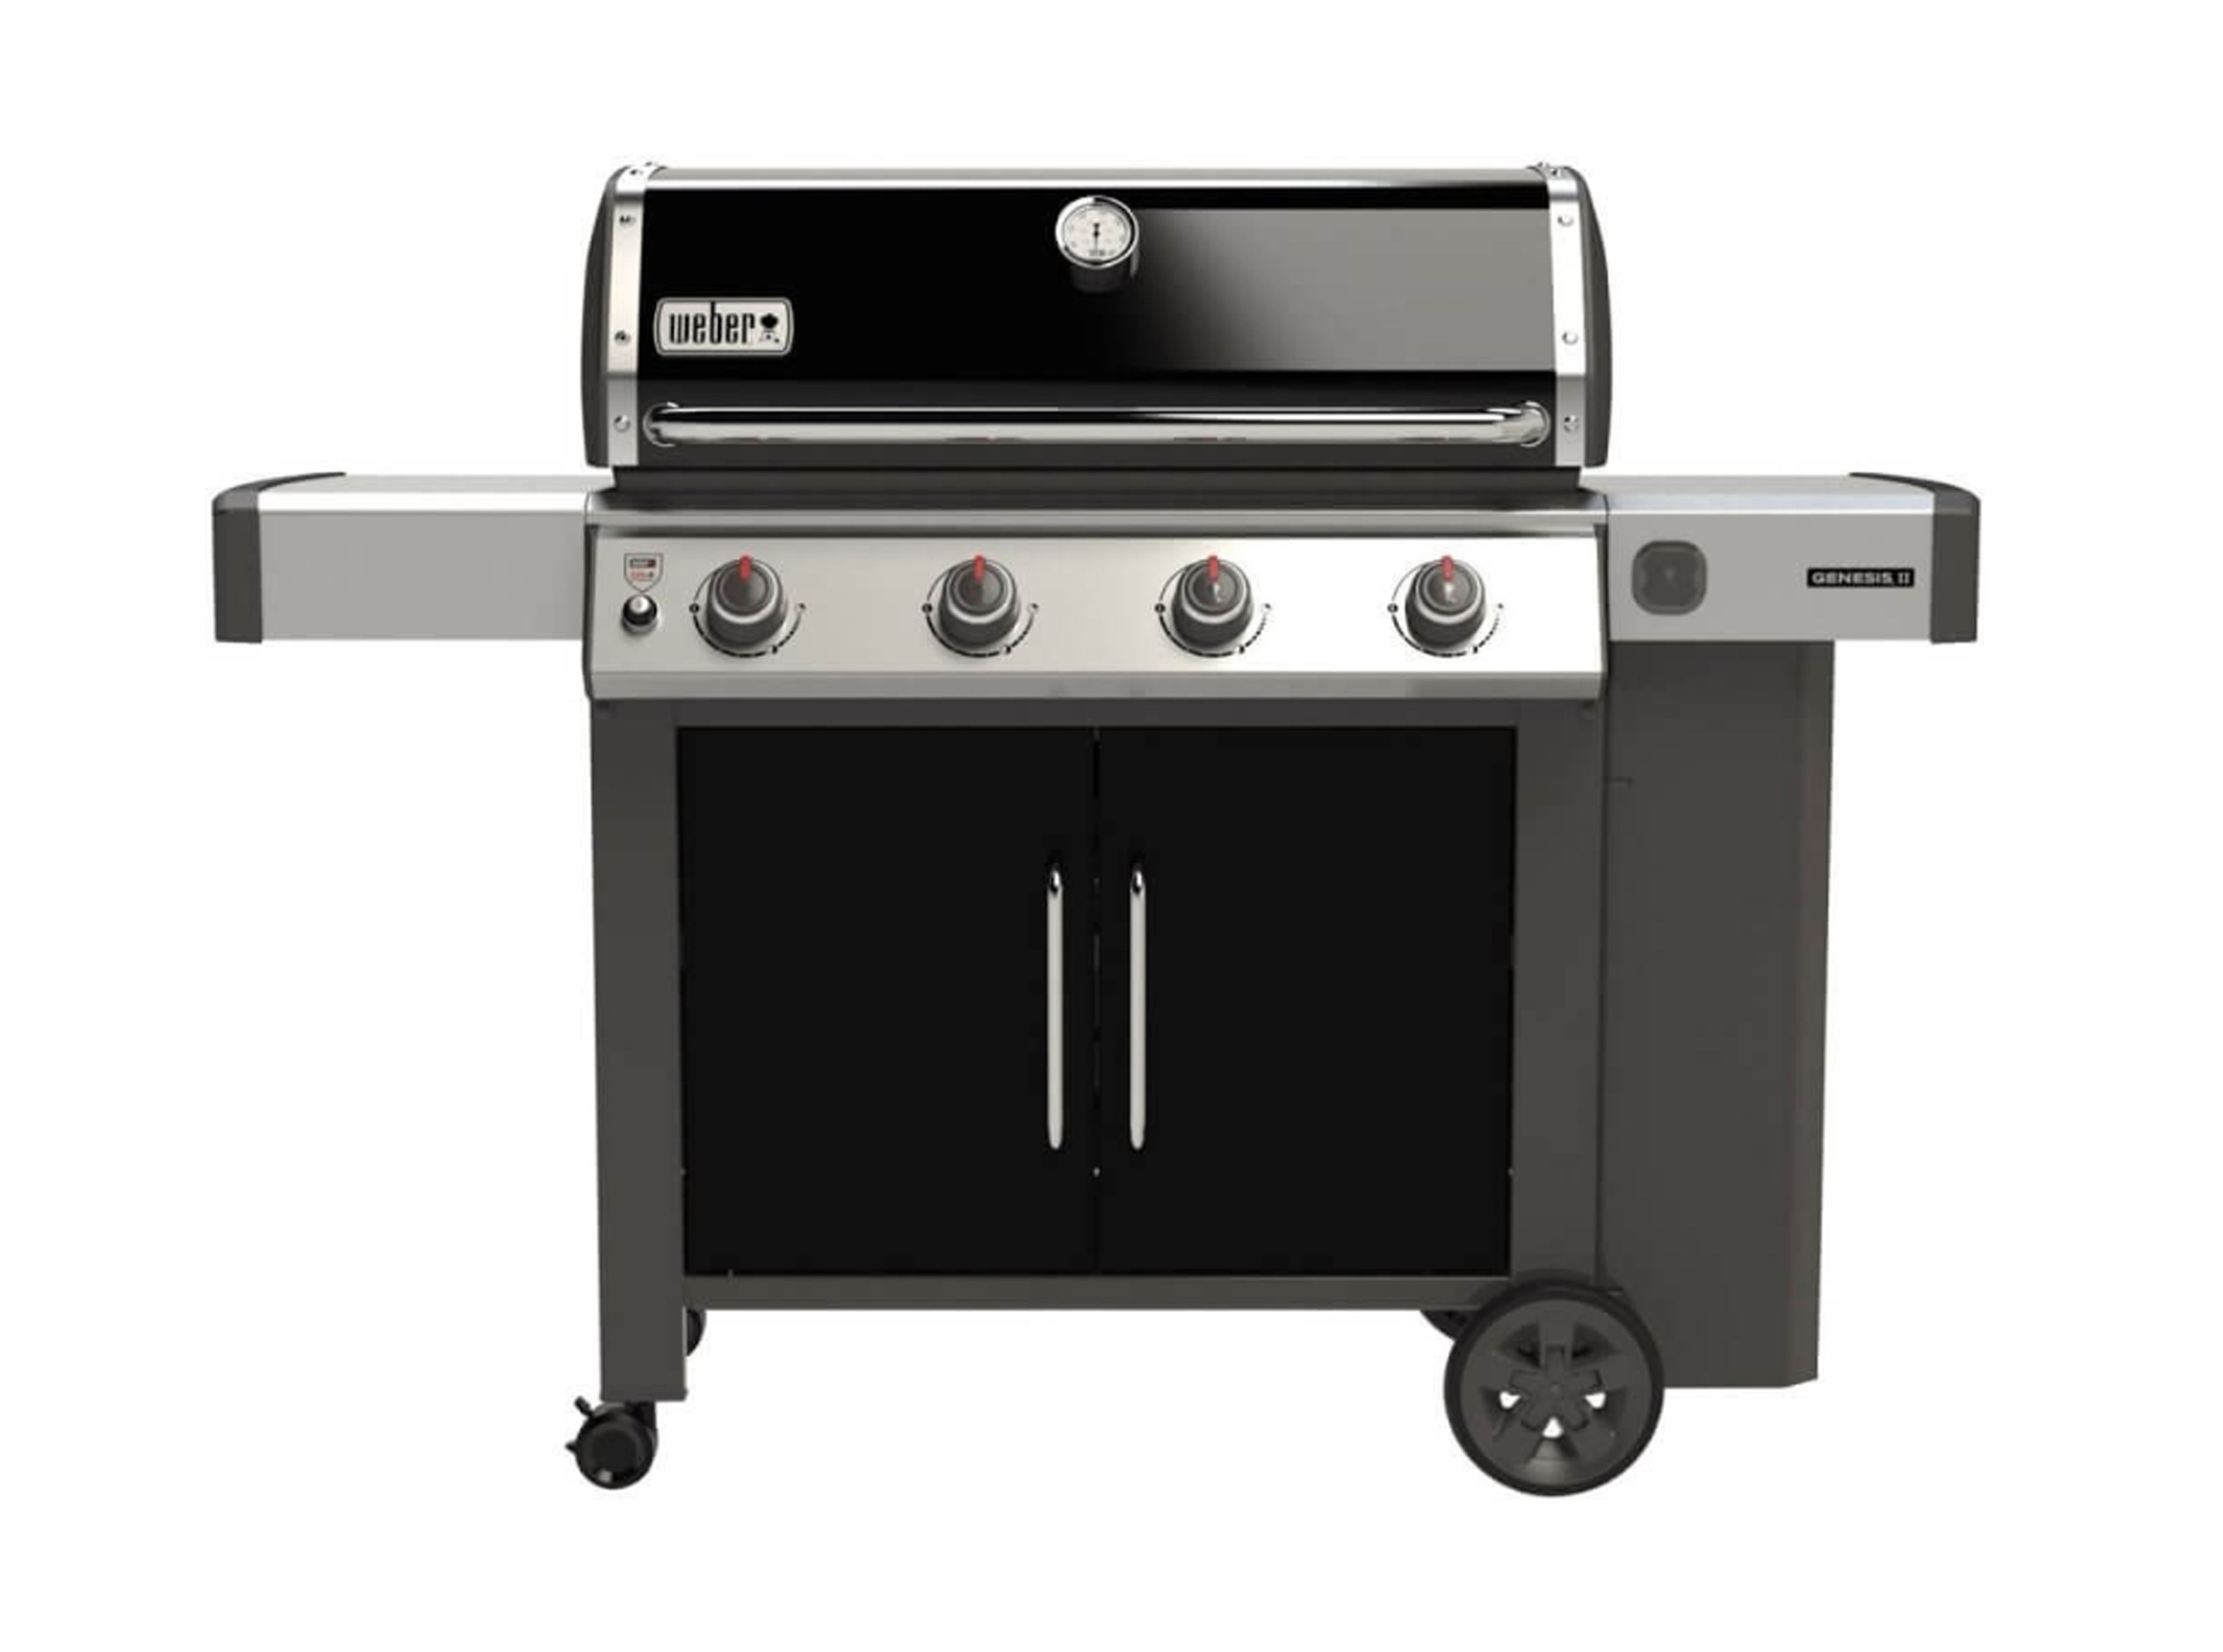 Weber | BBQ Genesis II E-415 GBS | Black